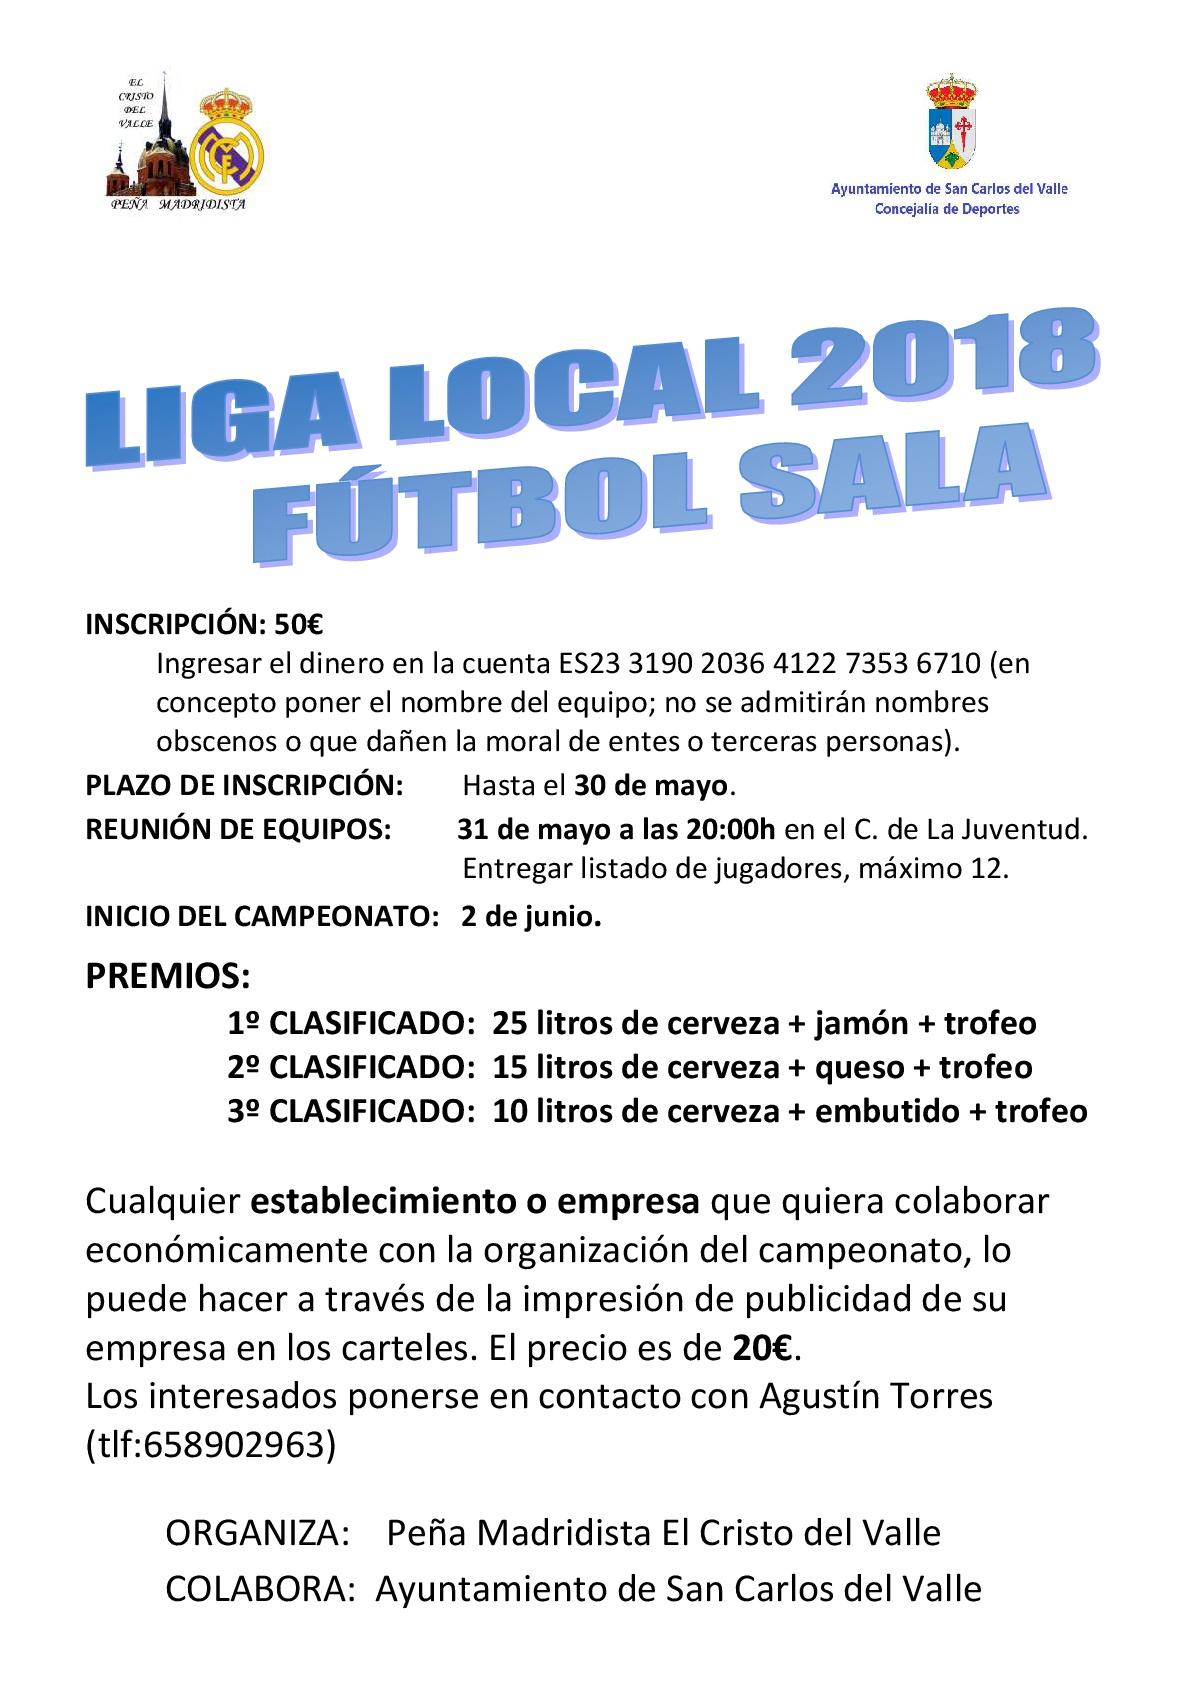 liga local fútbol sala 2018 4c81ec27ebd78